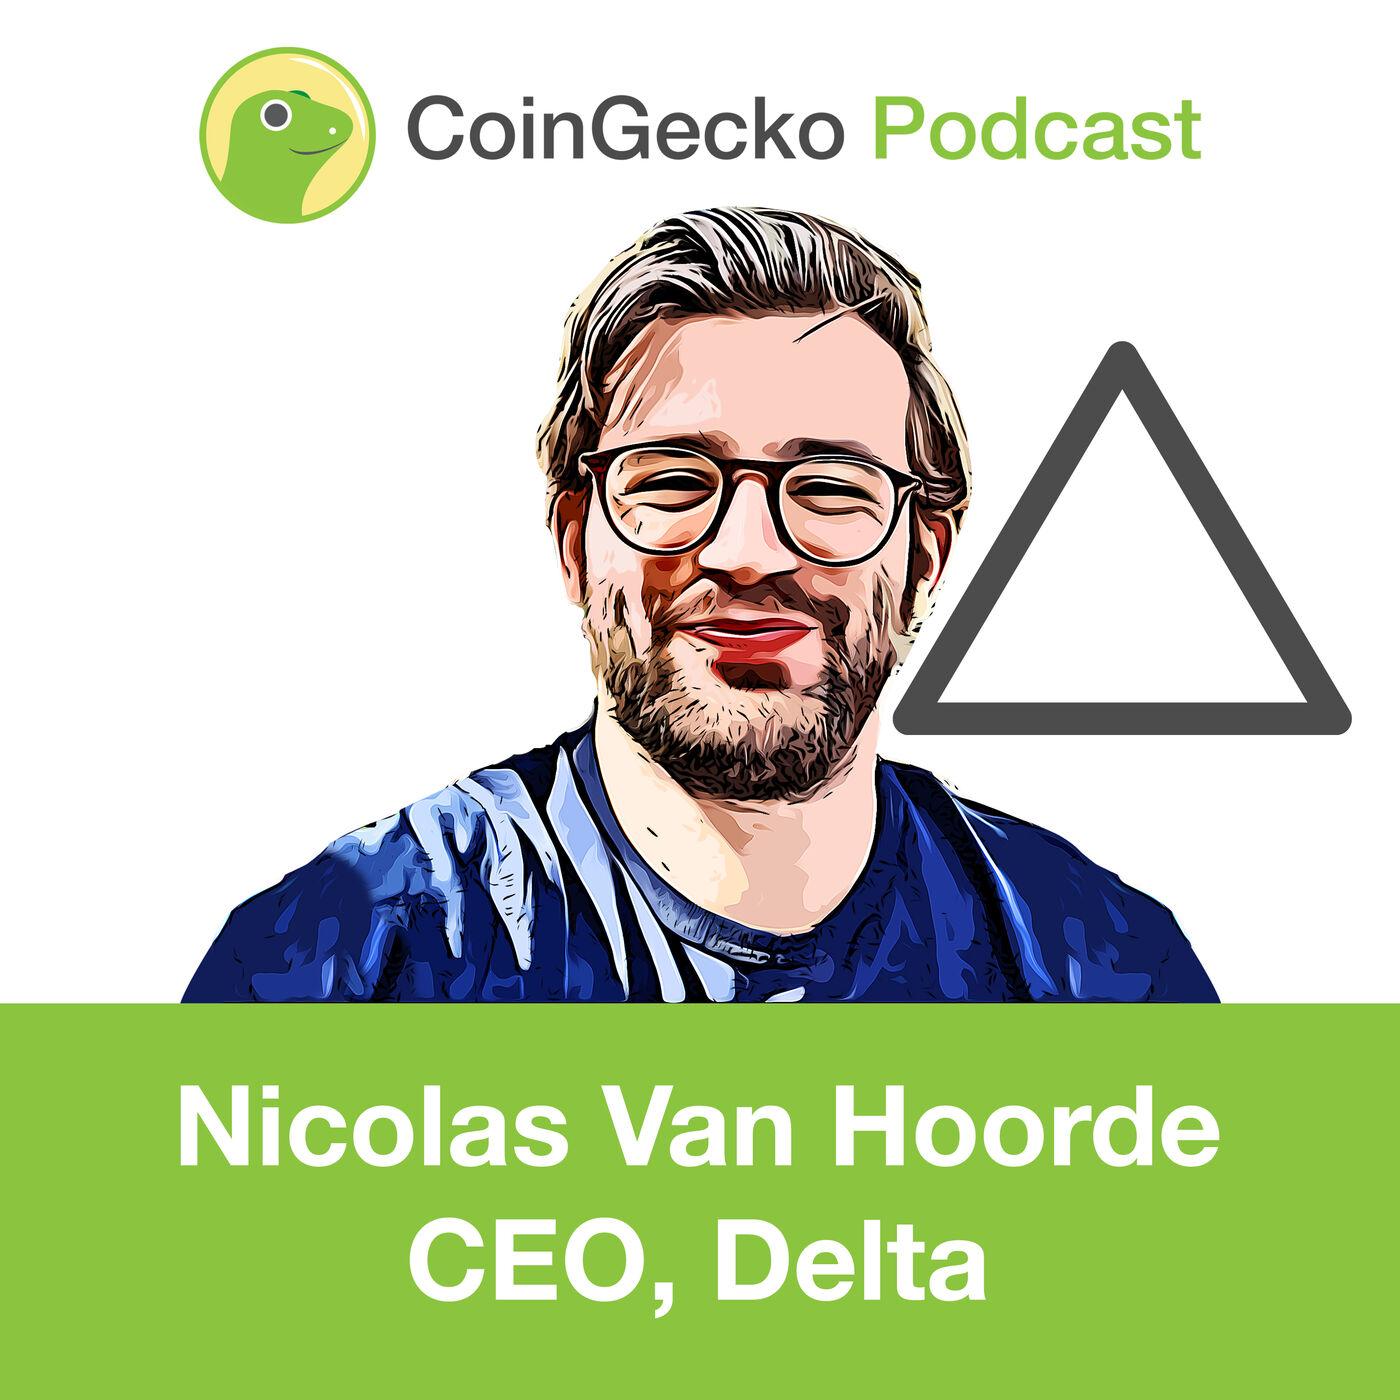 Nicolas Van Hoorde Talks About Delta And His eToro Acquisition - Ep. 8